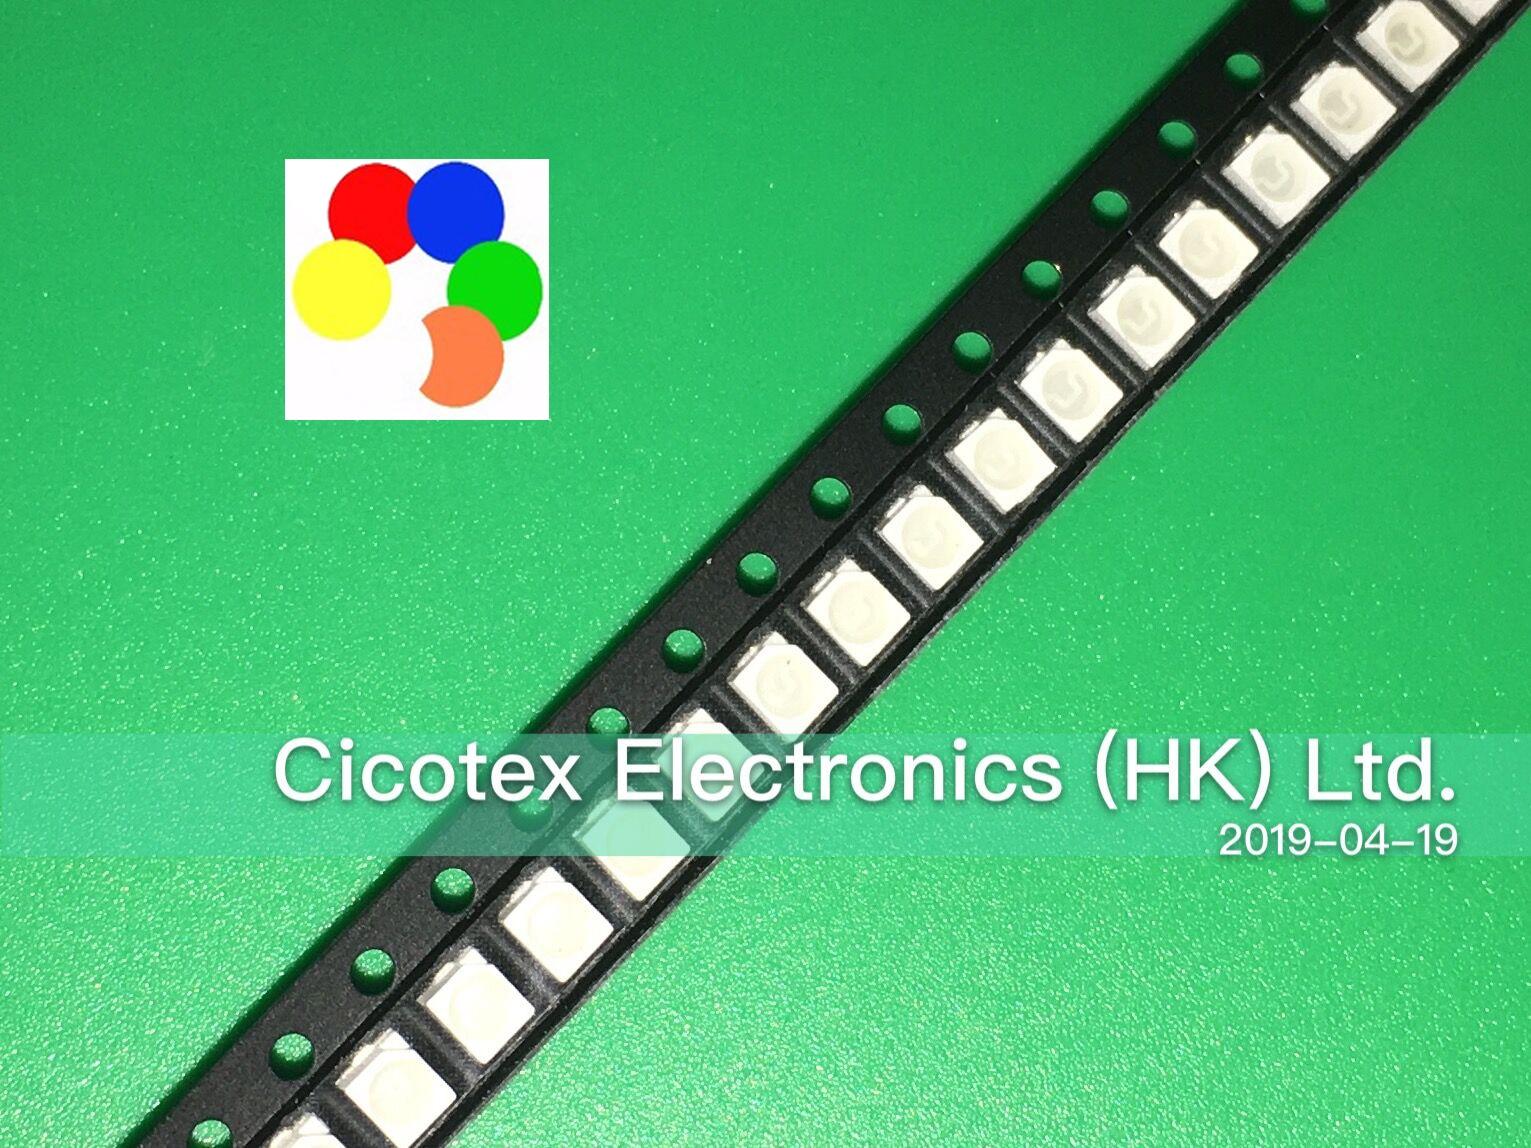 50PCS 1210 3528 Super Bright Blue SMD LED 3.5mm×2.8mm